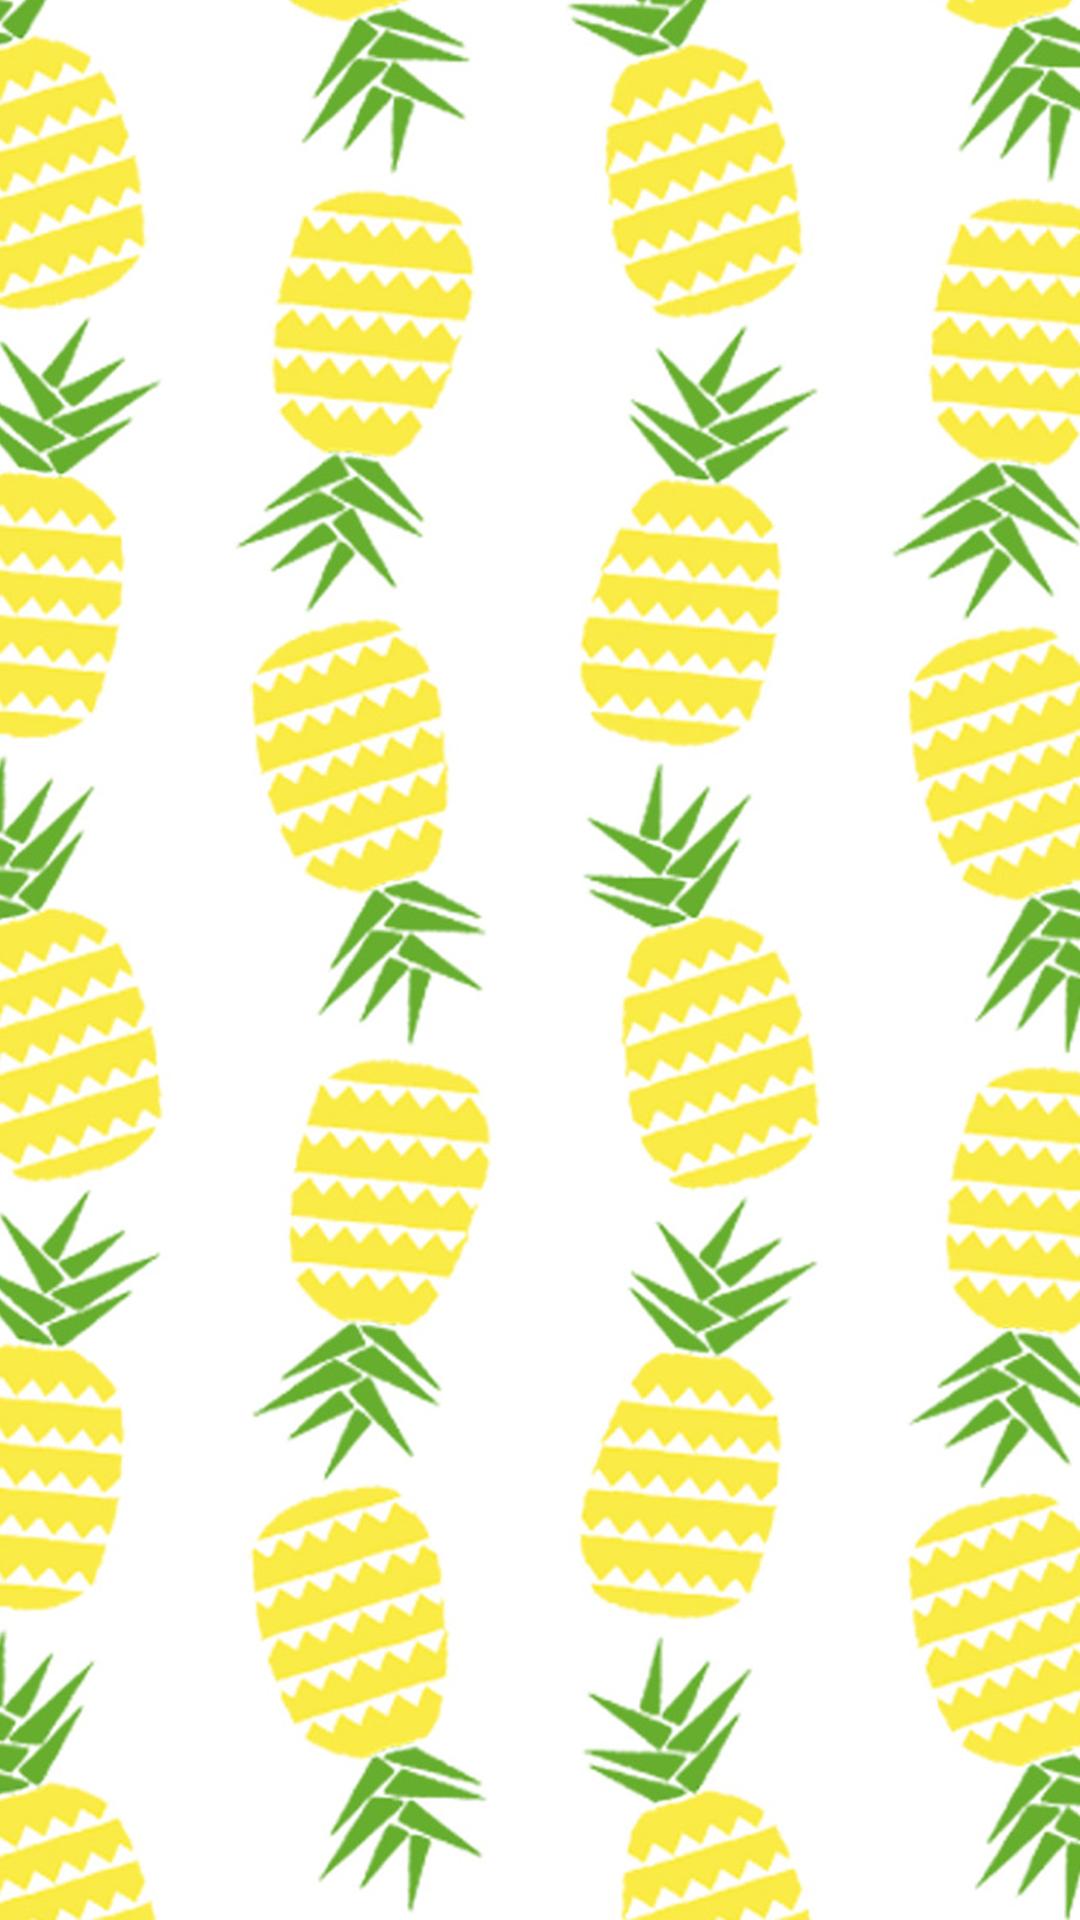 Good Wallpaper Home Screen Pineapple - c7aa31f0250bb4c5e851522e2e258d8f  Trends_549399.png